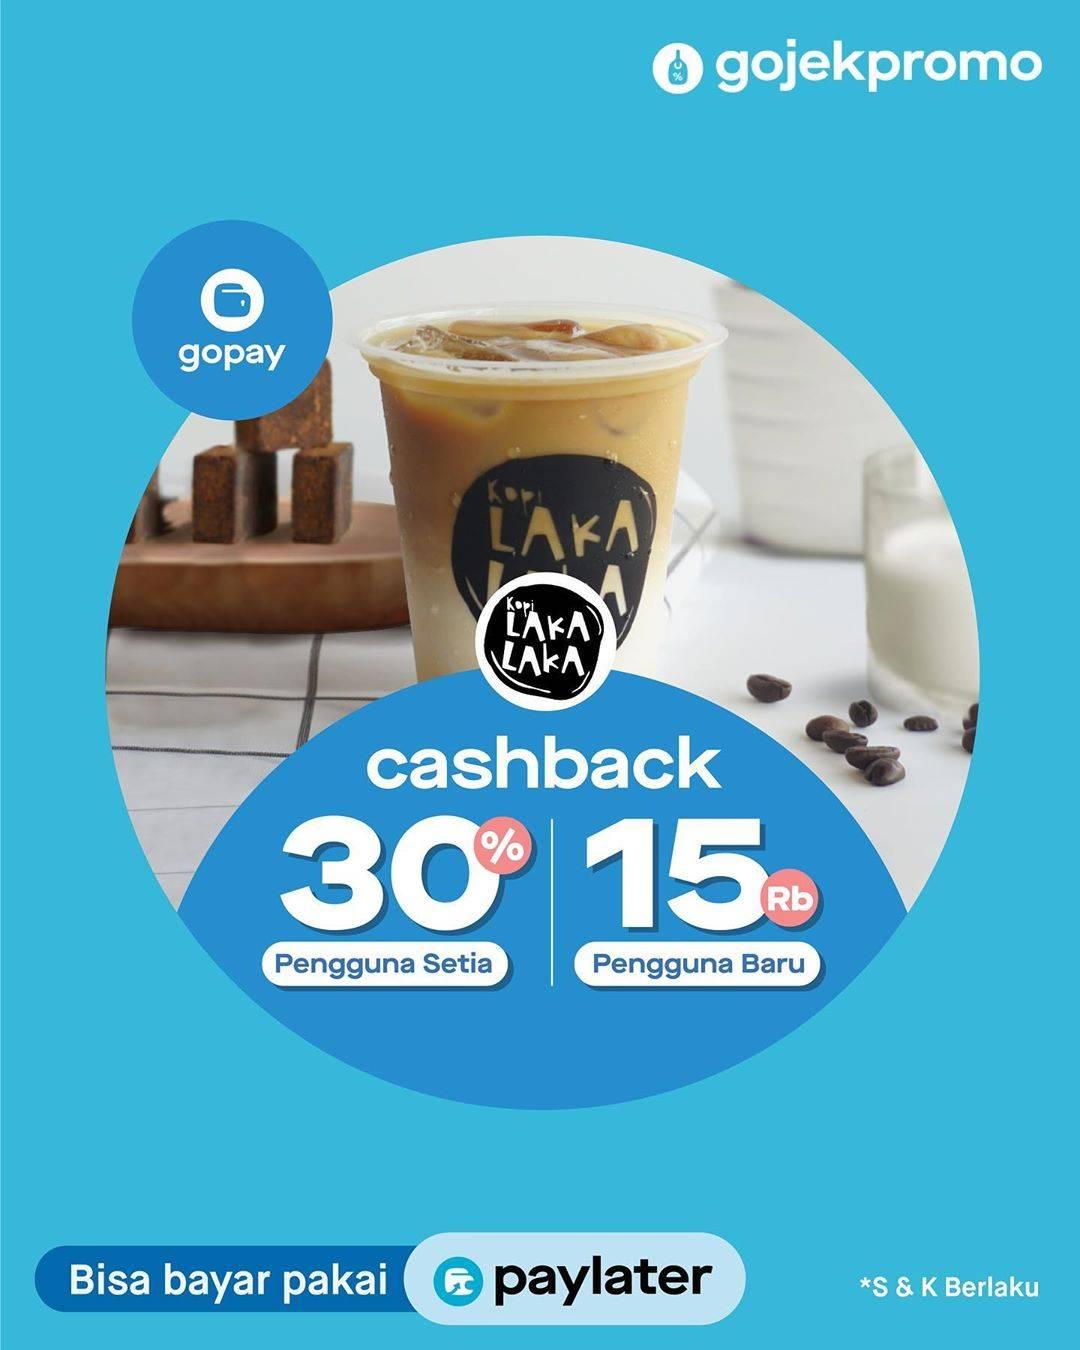 Laka - Laka Promo Cashback 30% dan Cashback Rp. 15ribu Melalui Gopay